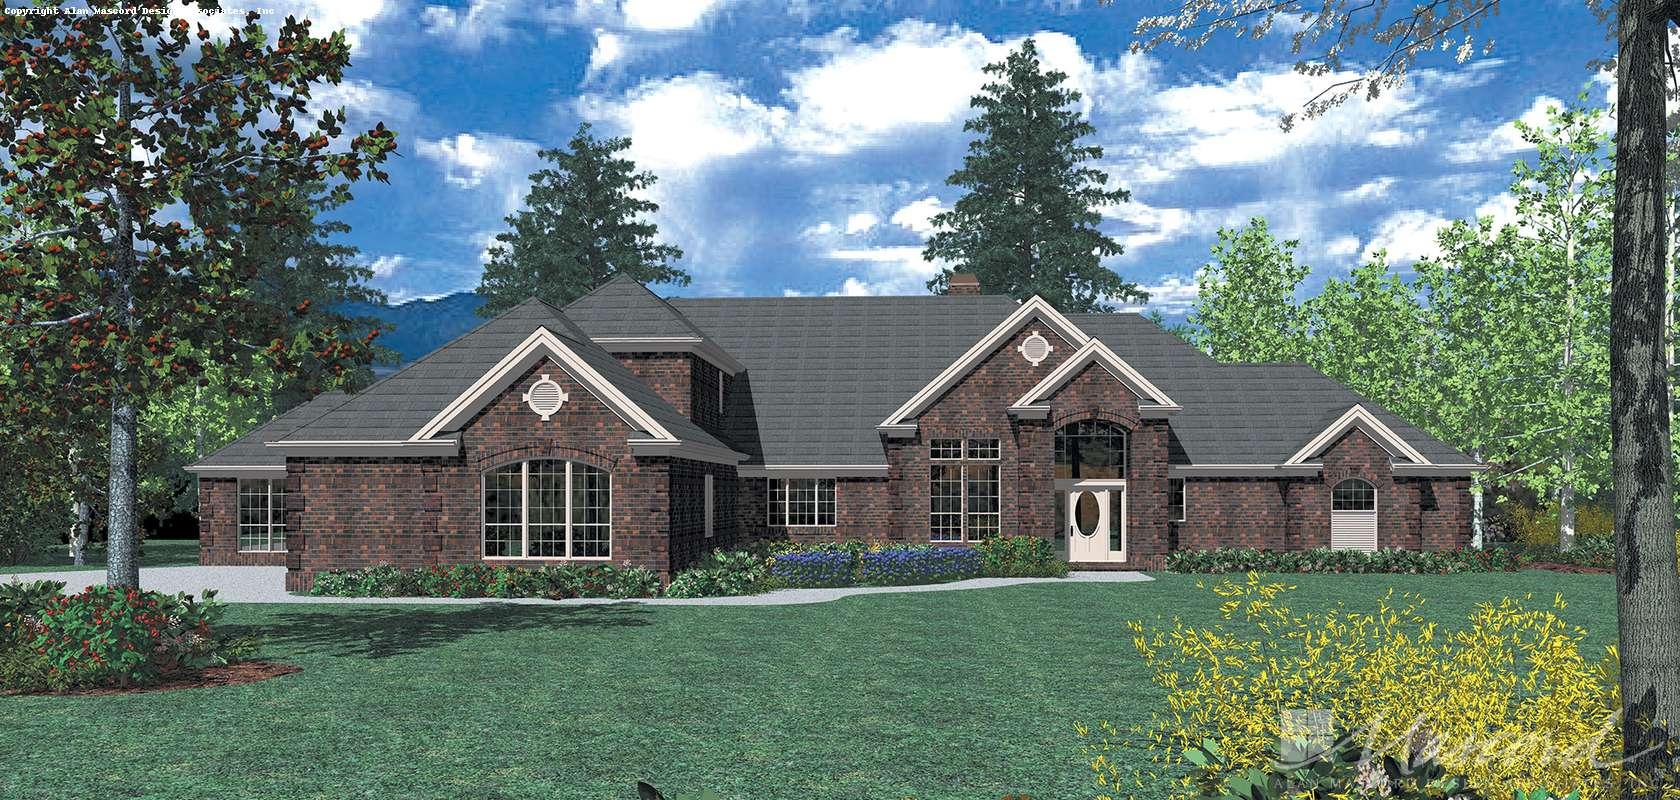 Mascord House Plan 2420: The Gatelyn